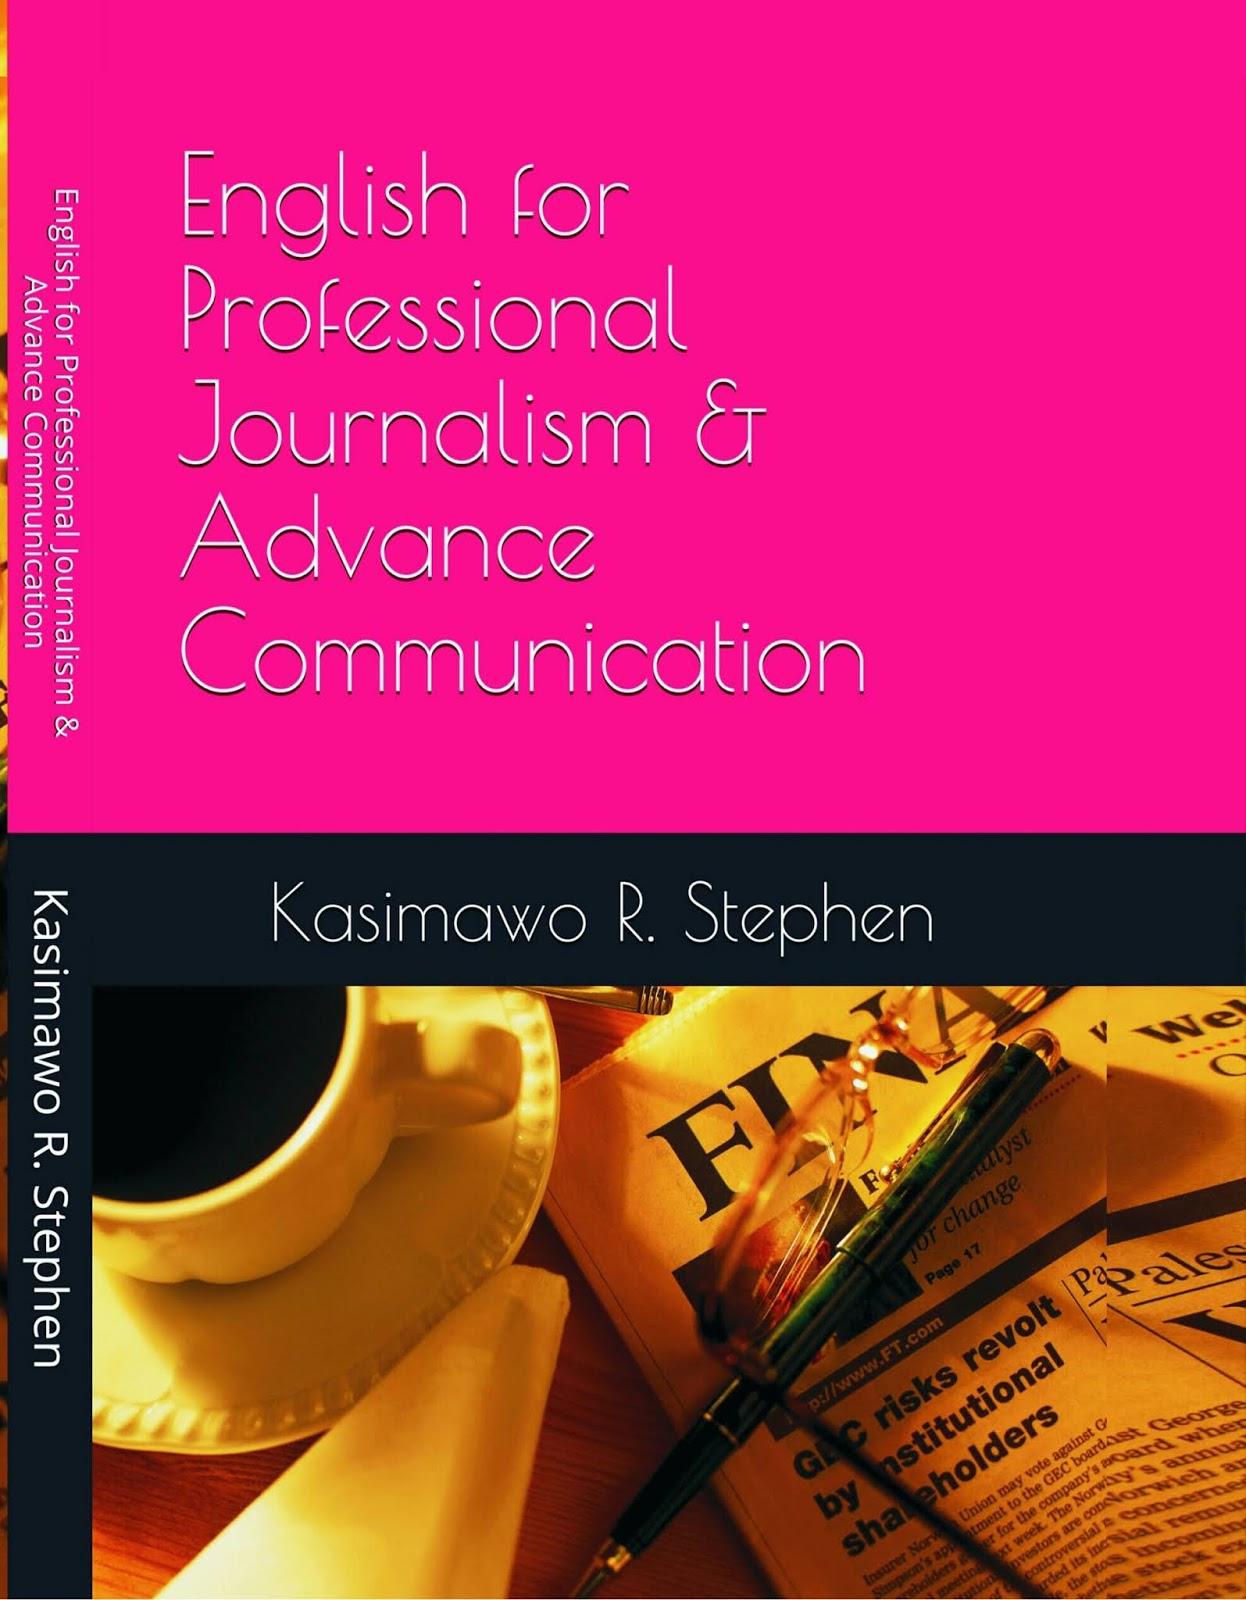 English for Professional Journalism and Advance Communication : 2018